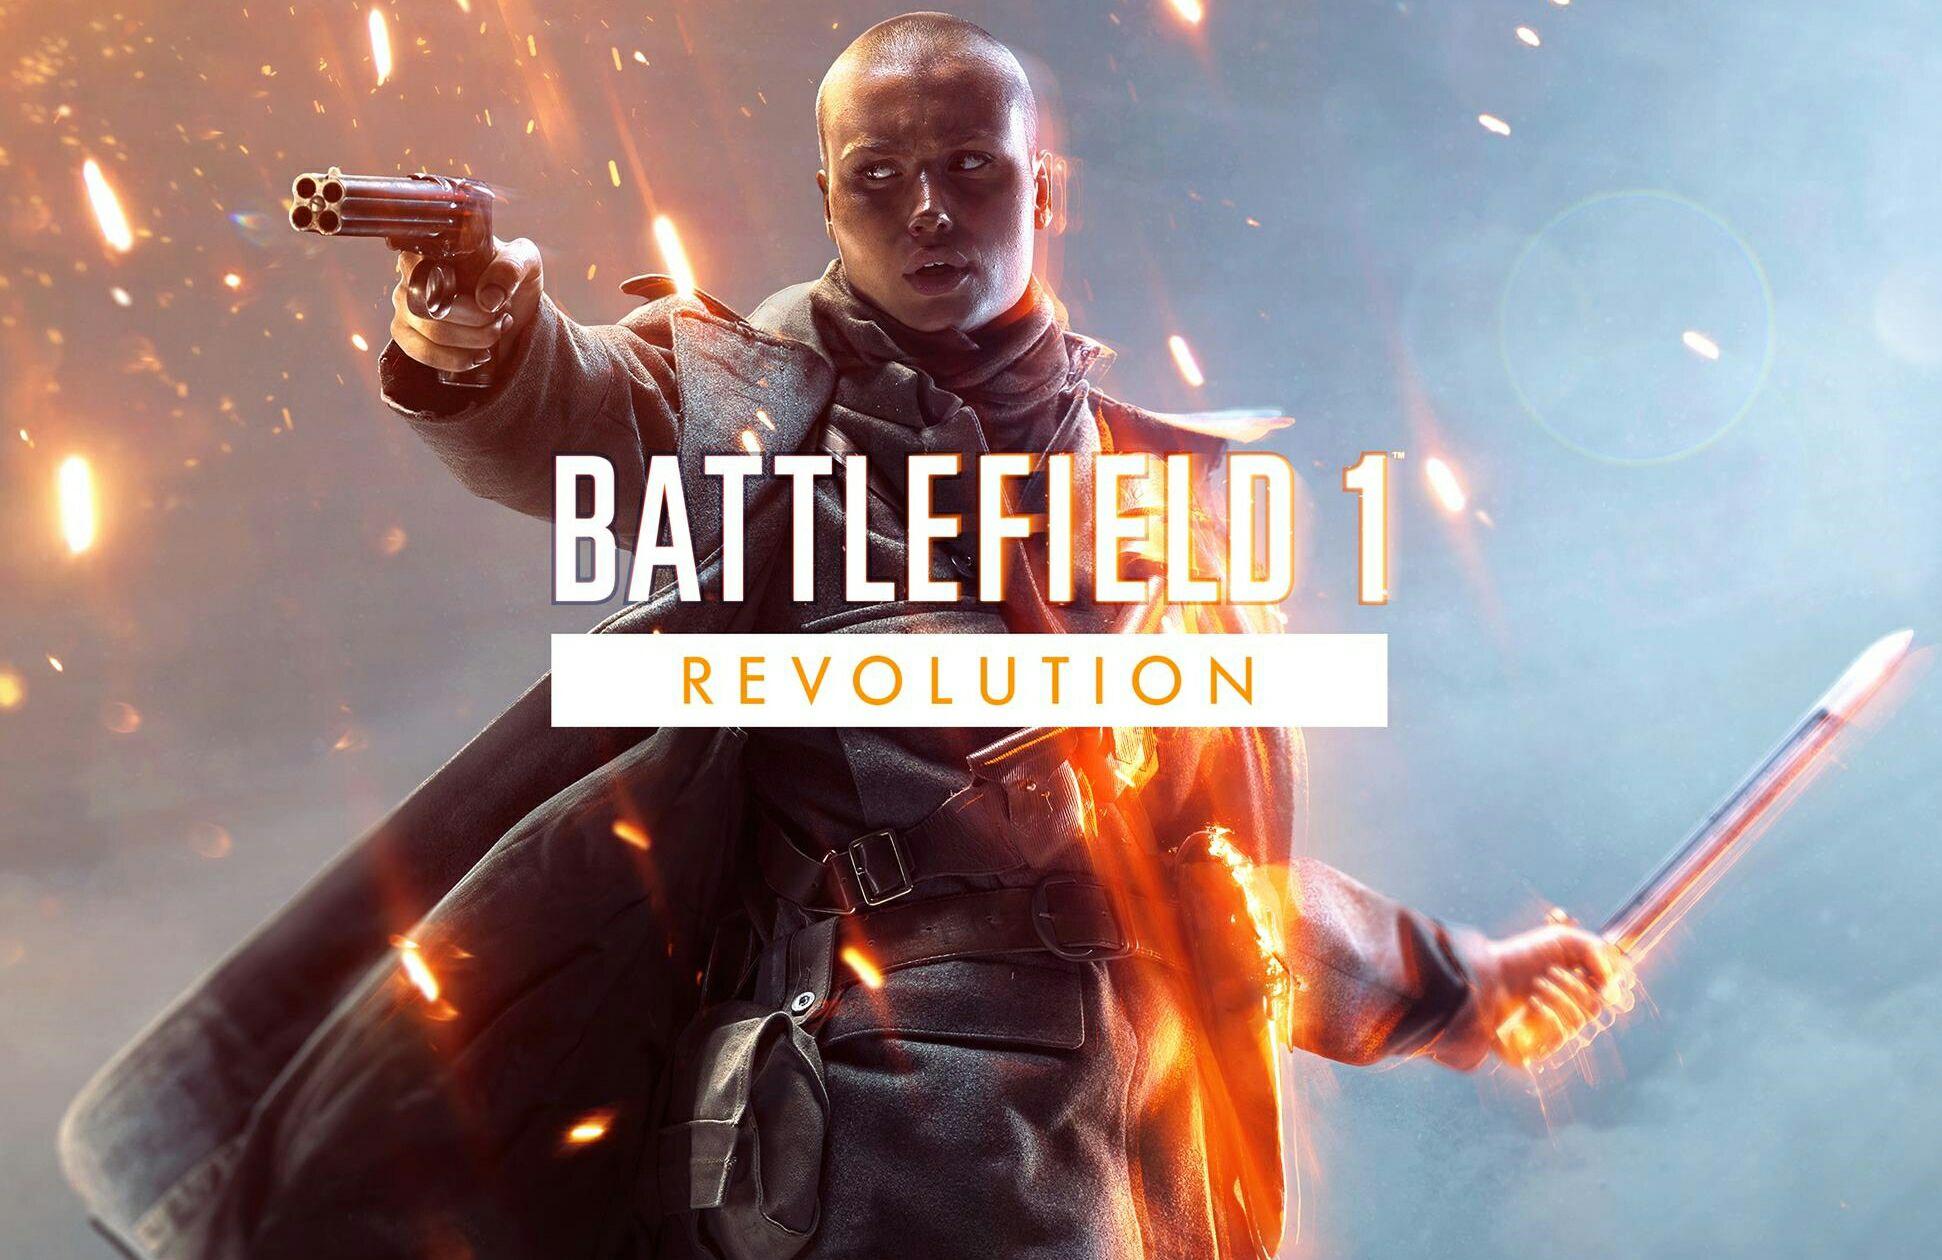 [PC] [Origin] Battlefield 1 Revolution - £27.49 @ Origin